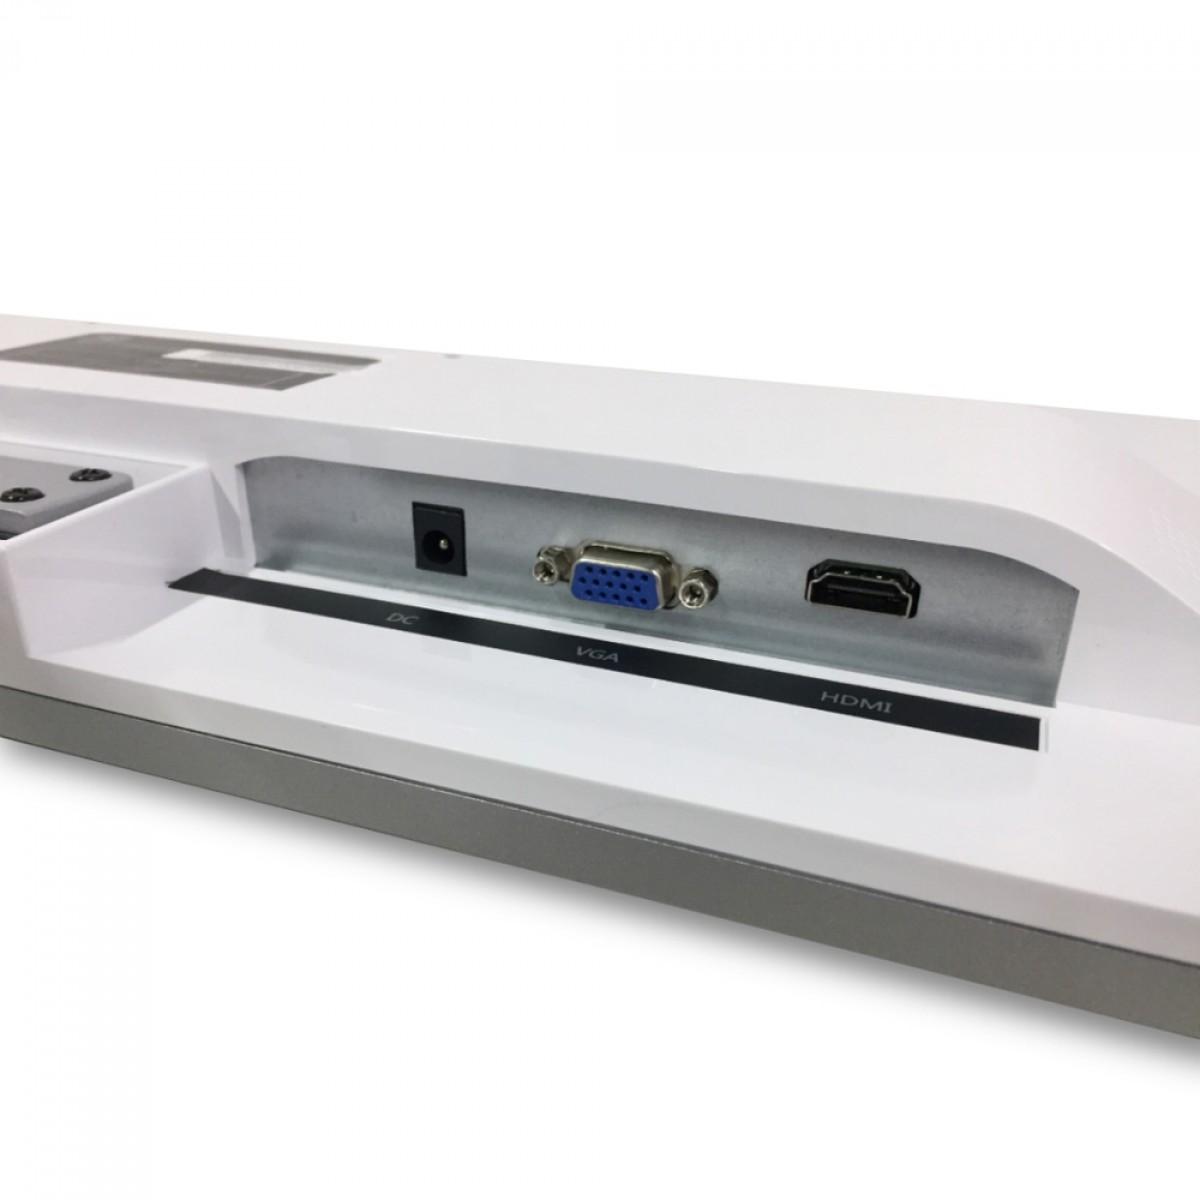 Monitor Gamer, HQ LED, 21.5 Pol, Full HD, HDMI/VGA, 21.5 HQ-LED SB